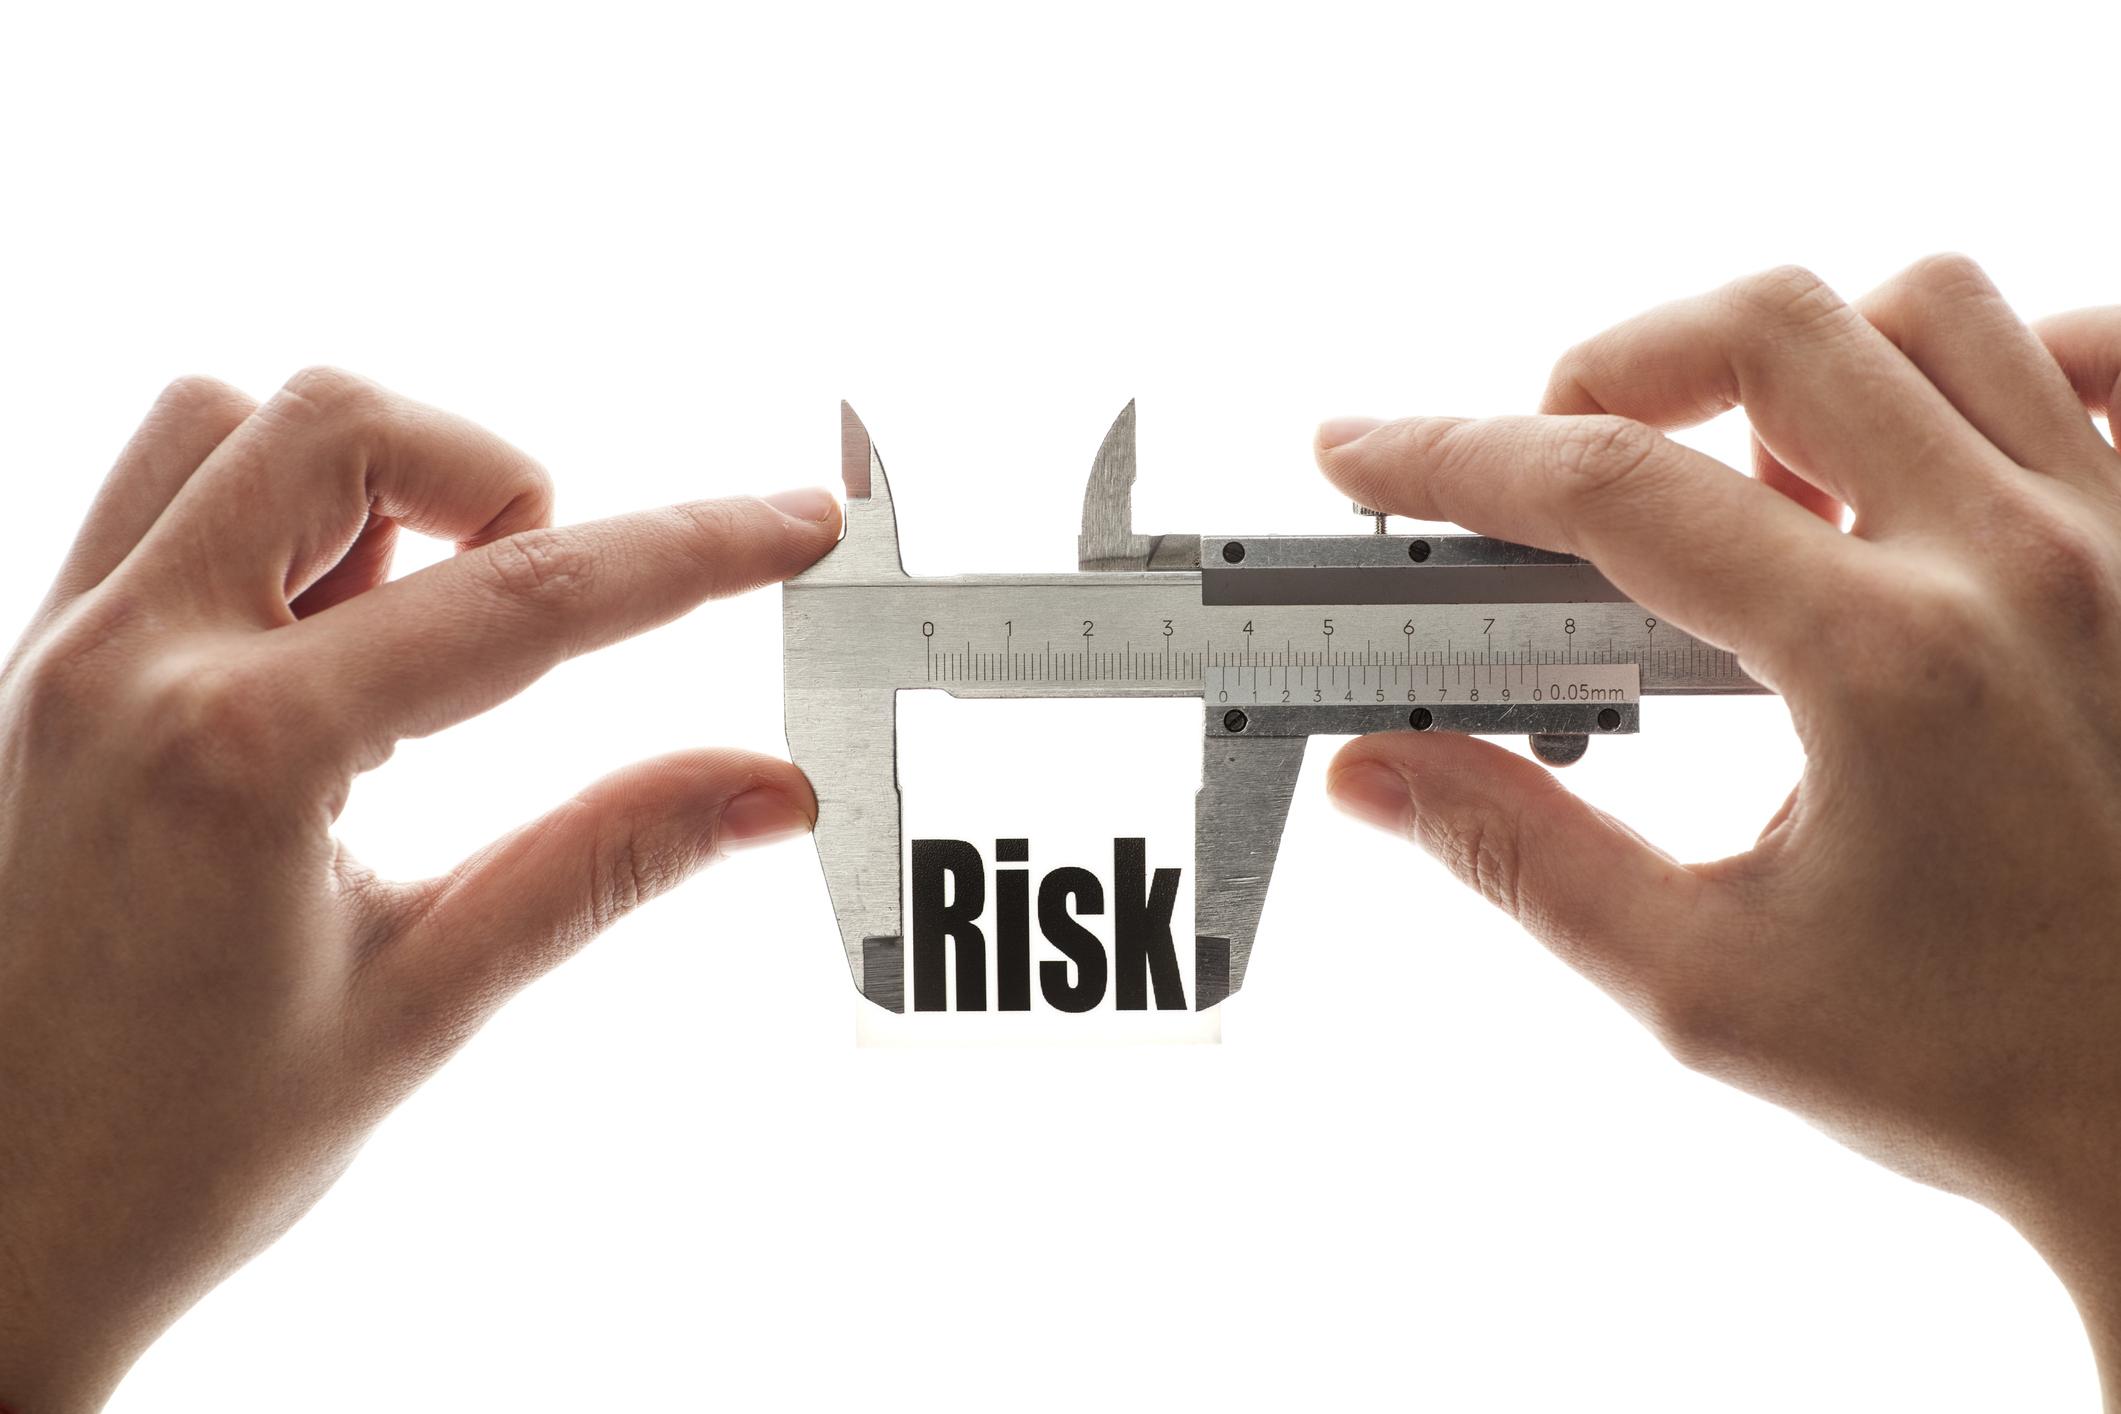 Measuring Risk